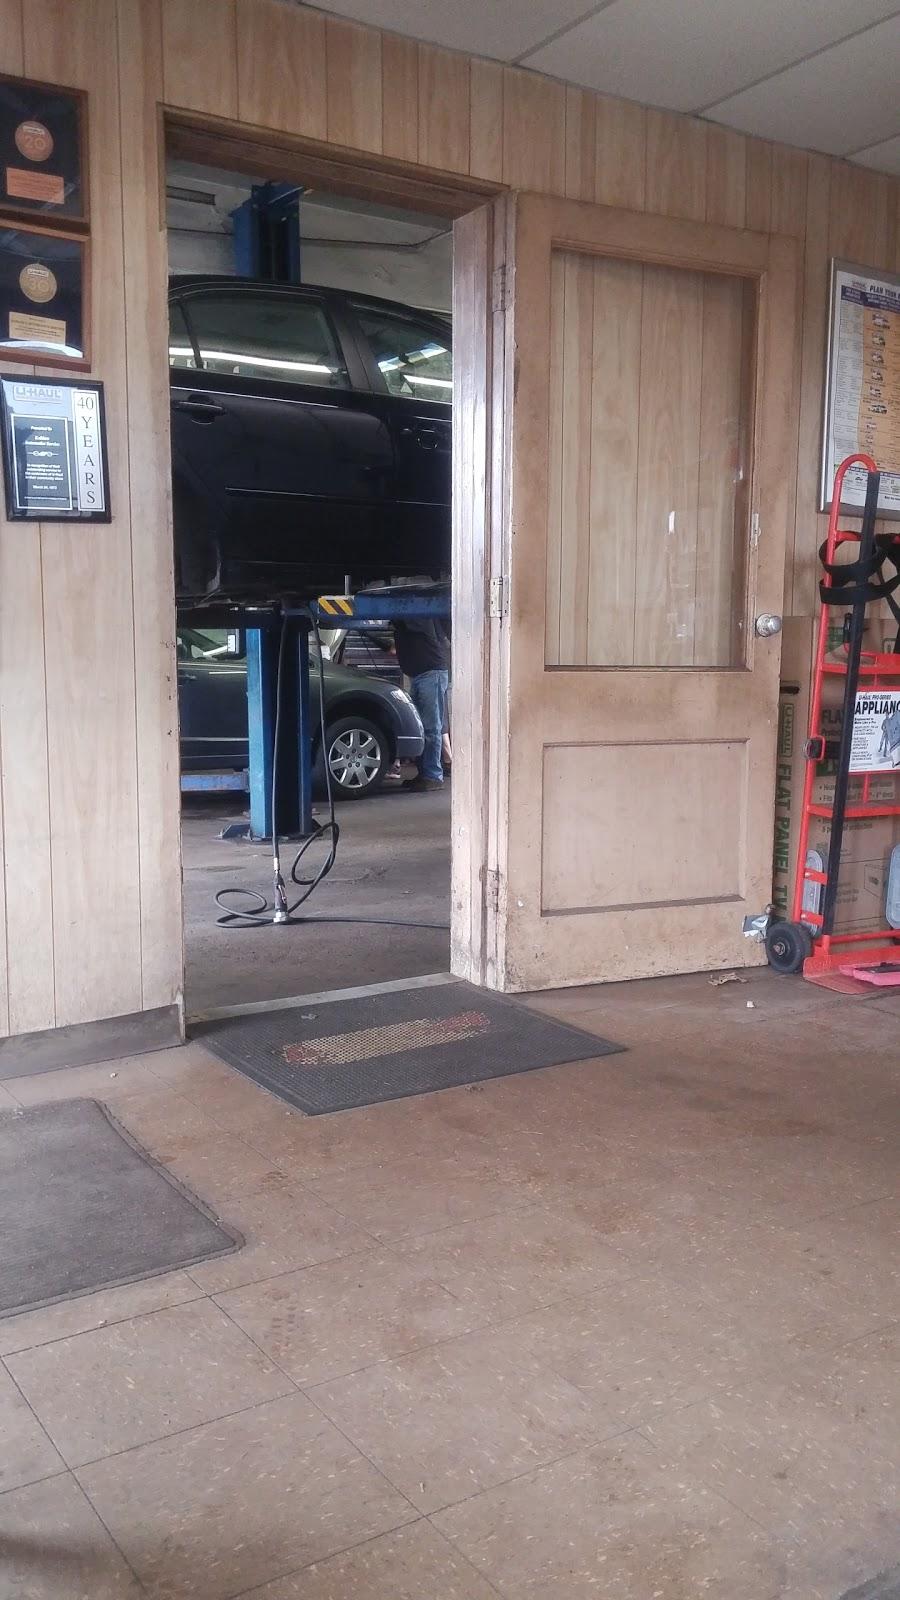 Kohler Auto Repair - car repair  | Photo 3 of 3 | Address: 5758 Darrow Rd, Hudson, OH 44236, USA | Phone: (330) 655-2534